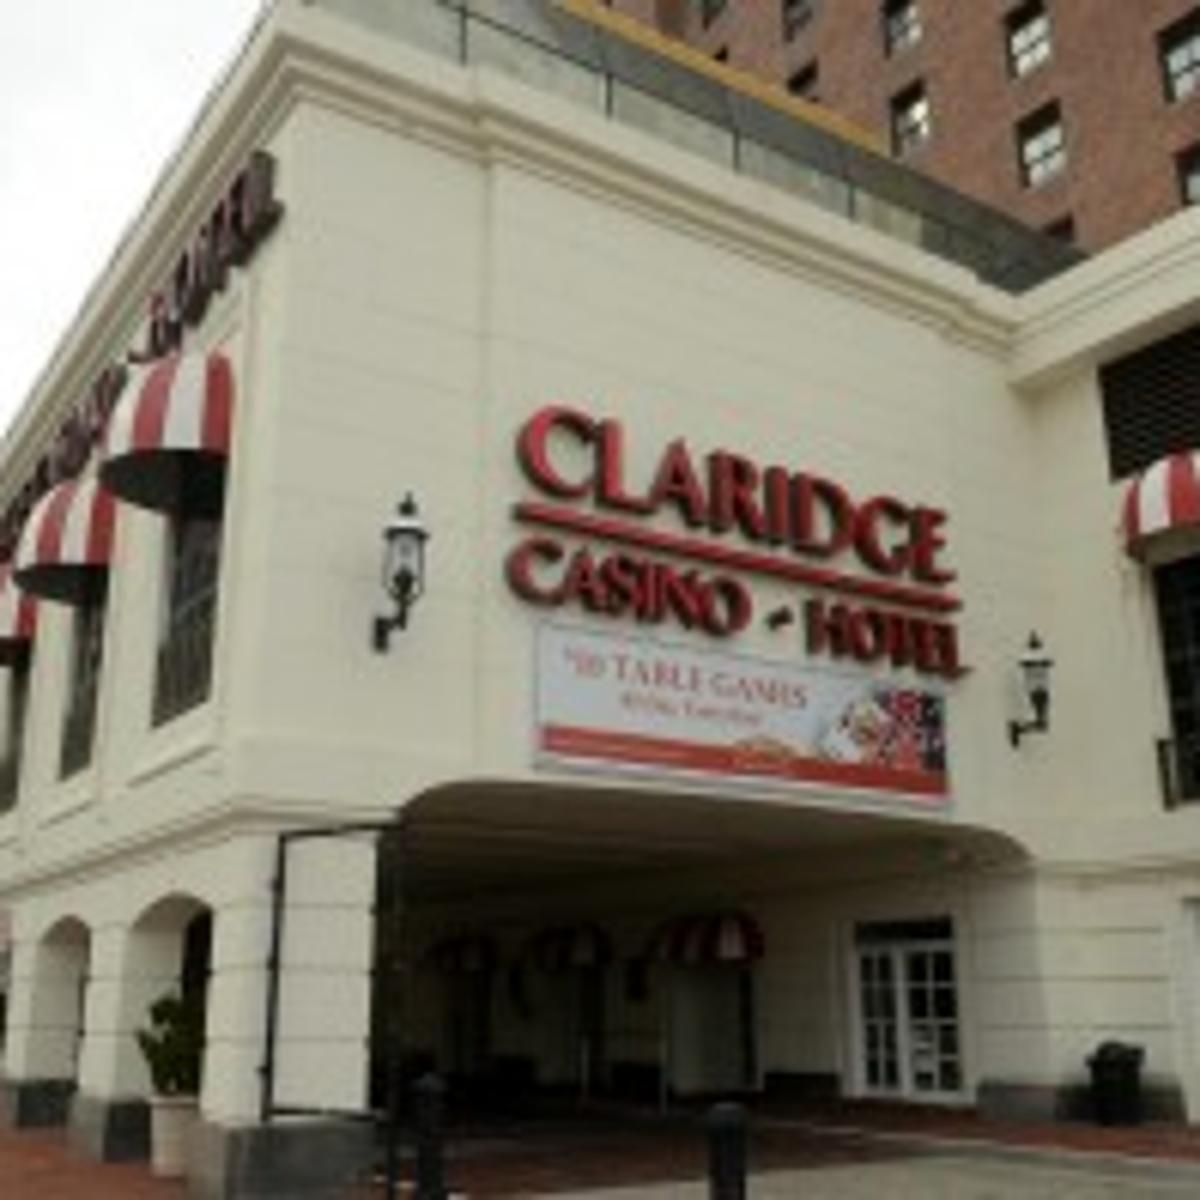 Claridge Casino Atlantic City Nj